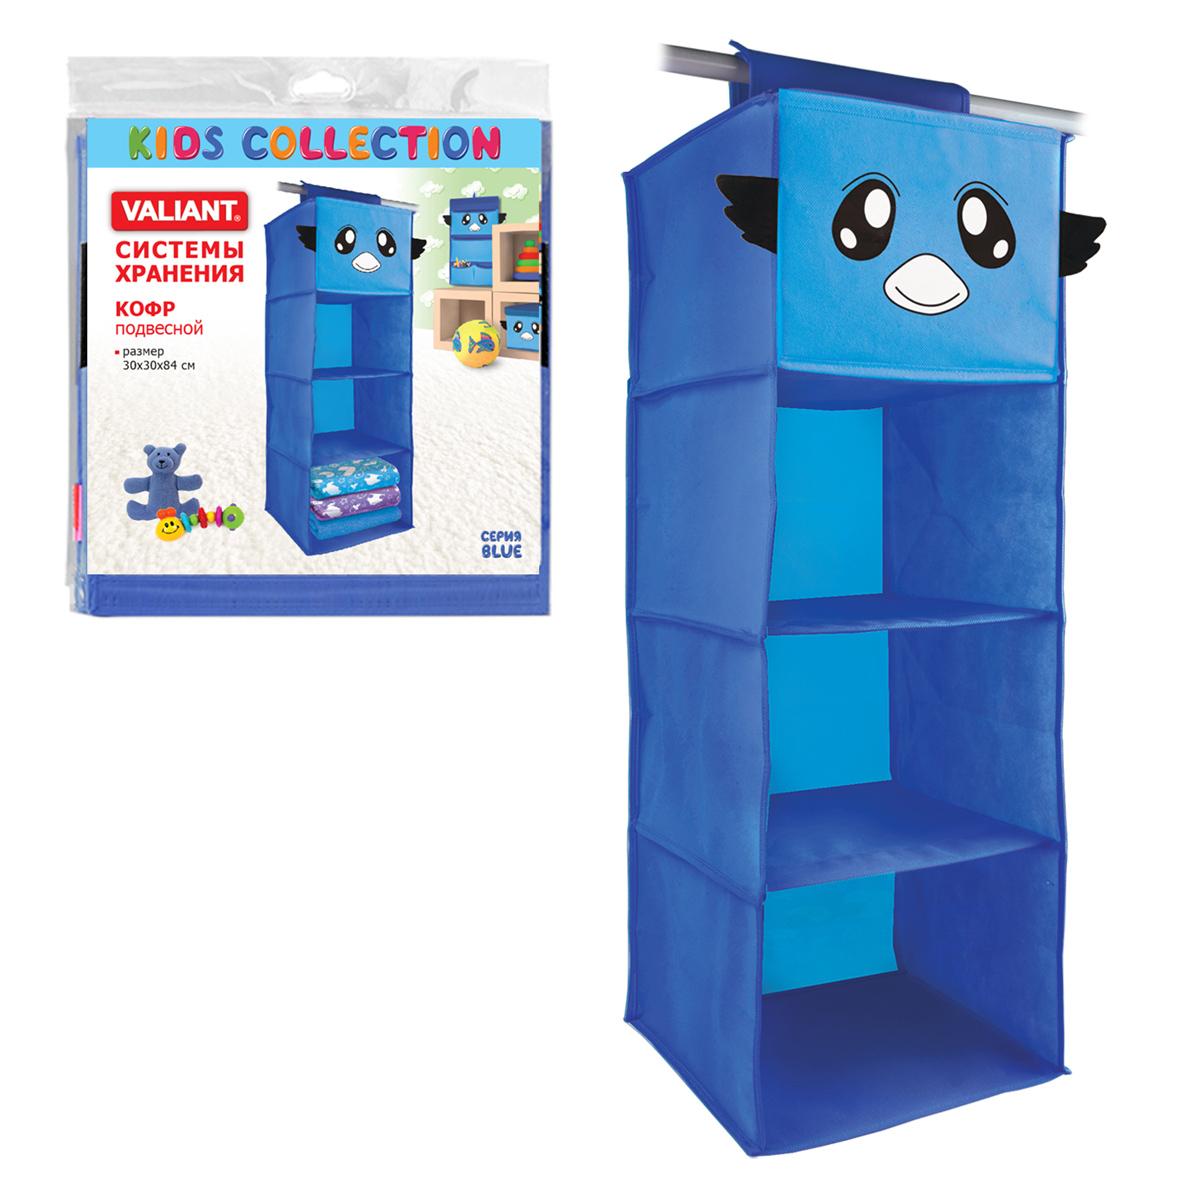 VAL BLU-12 Кофр подвесной, 4 полки, 30*30*84 см, цвет: синийBLU-12VAL BLU-12 Кофр подвесной, 4 полки, 30*30*84 см Серия: Kids Collections